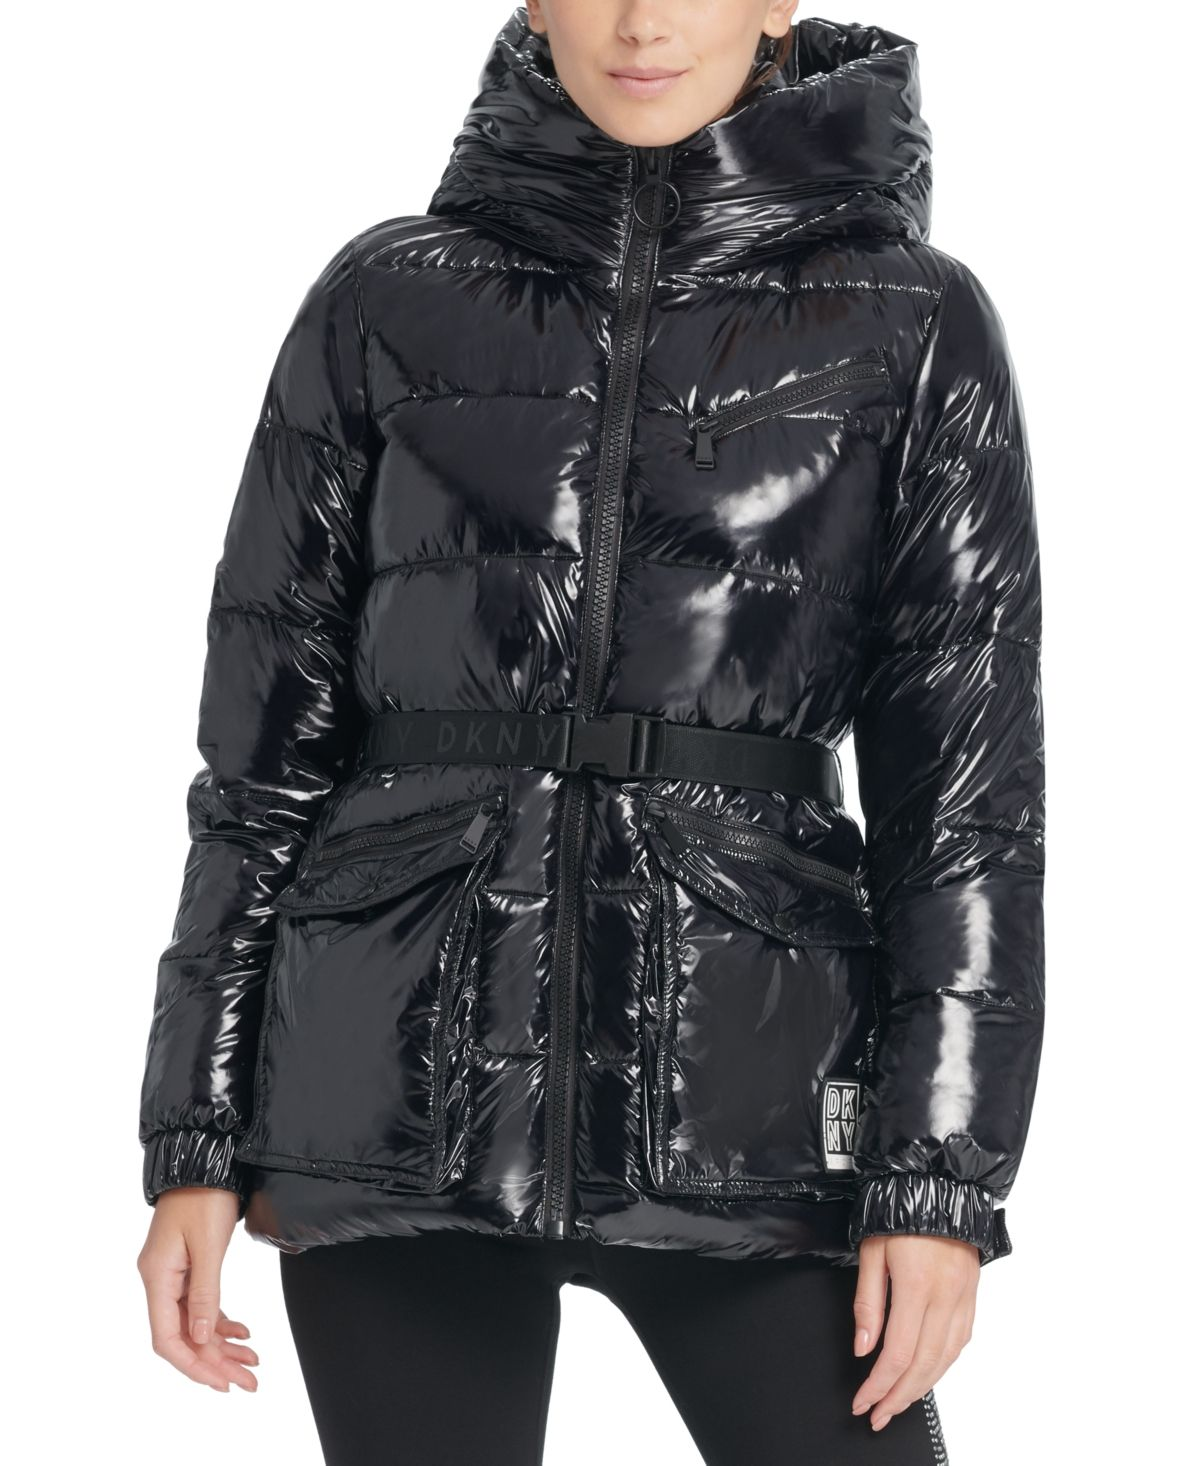 Dkny Sport Belted Hooded Puffer Jacket Black Blazer